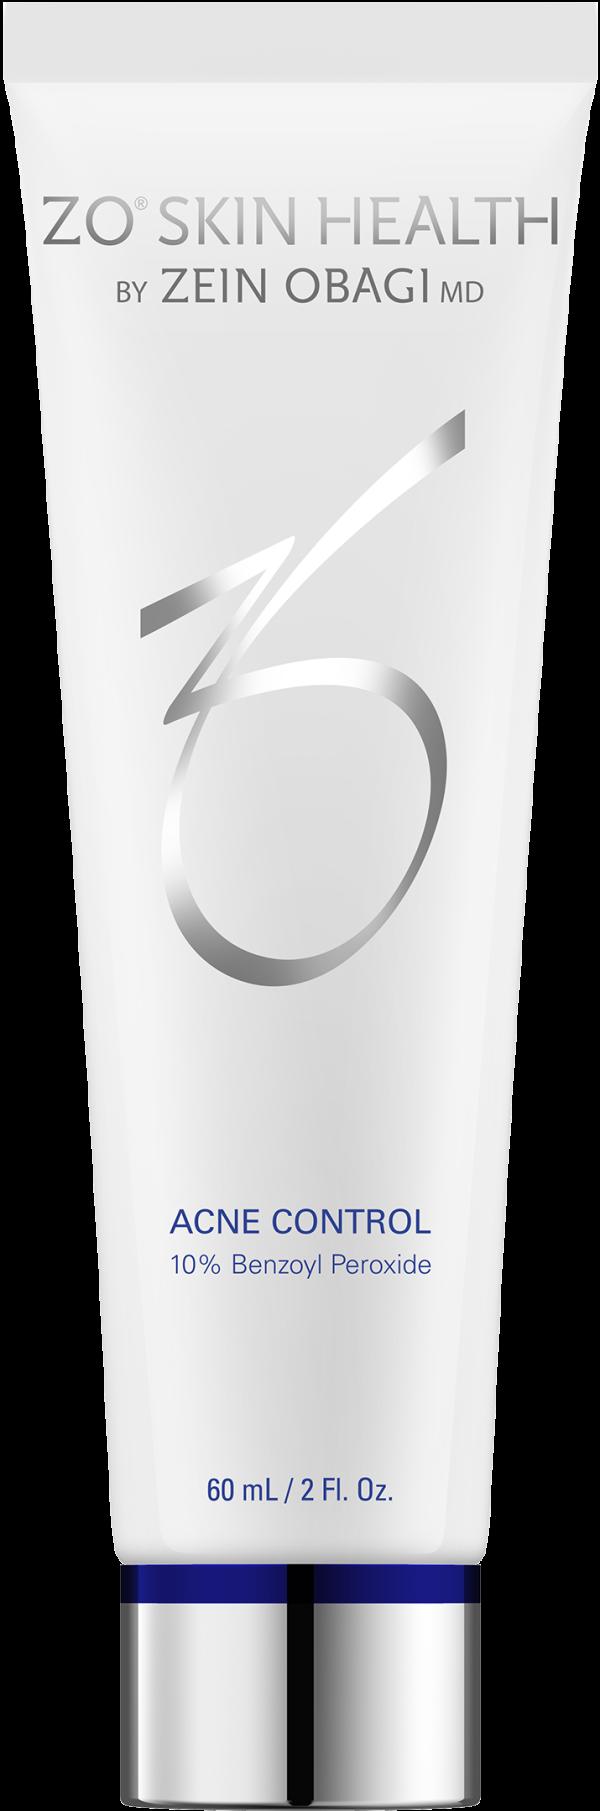 Zo Skin Acne Control Средство для проблемной кожи лица с 10% Benzoyl Peroxide, 60 мл